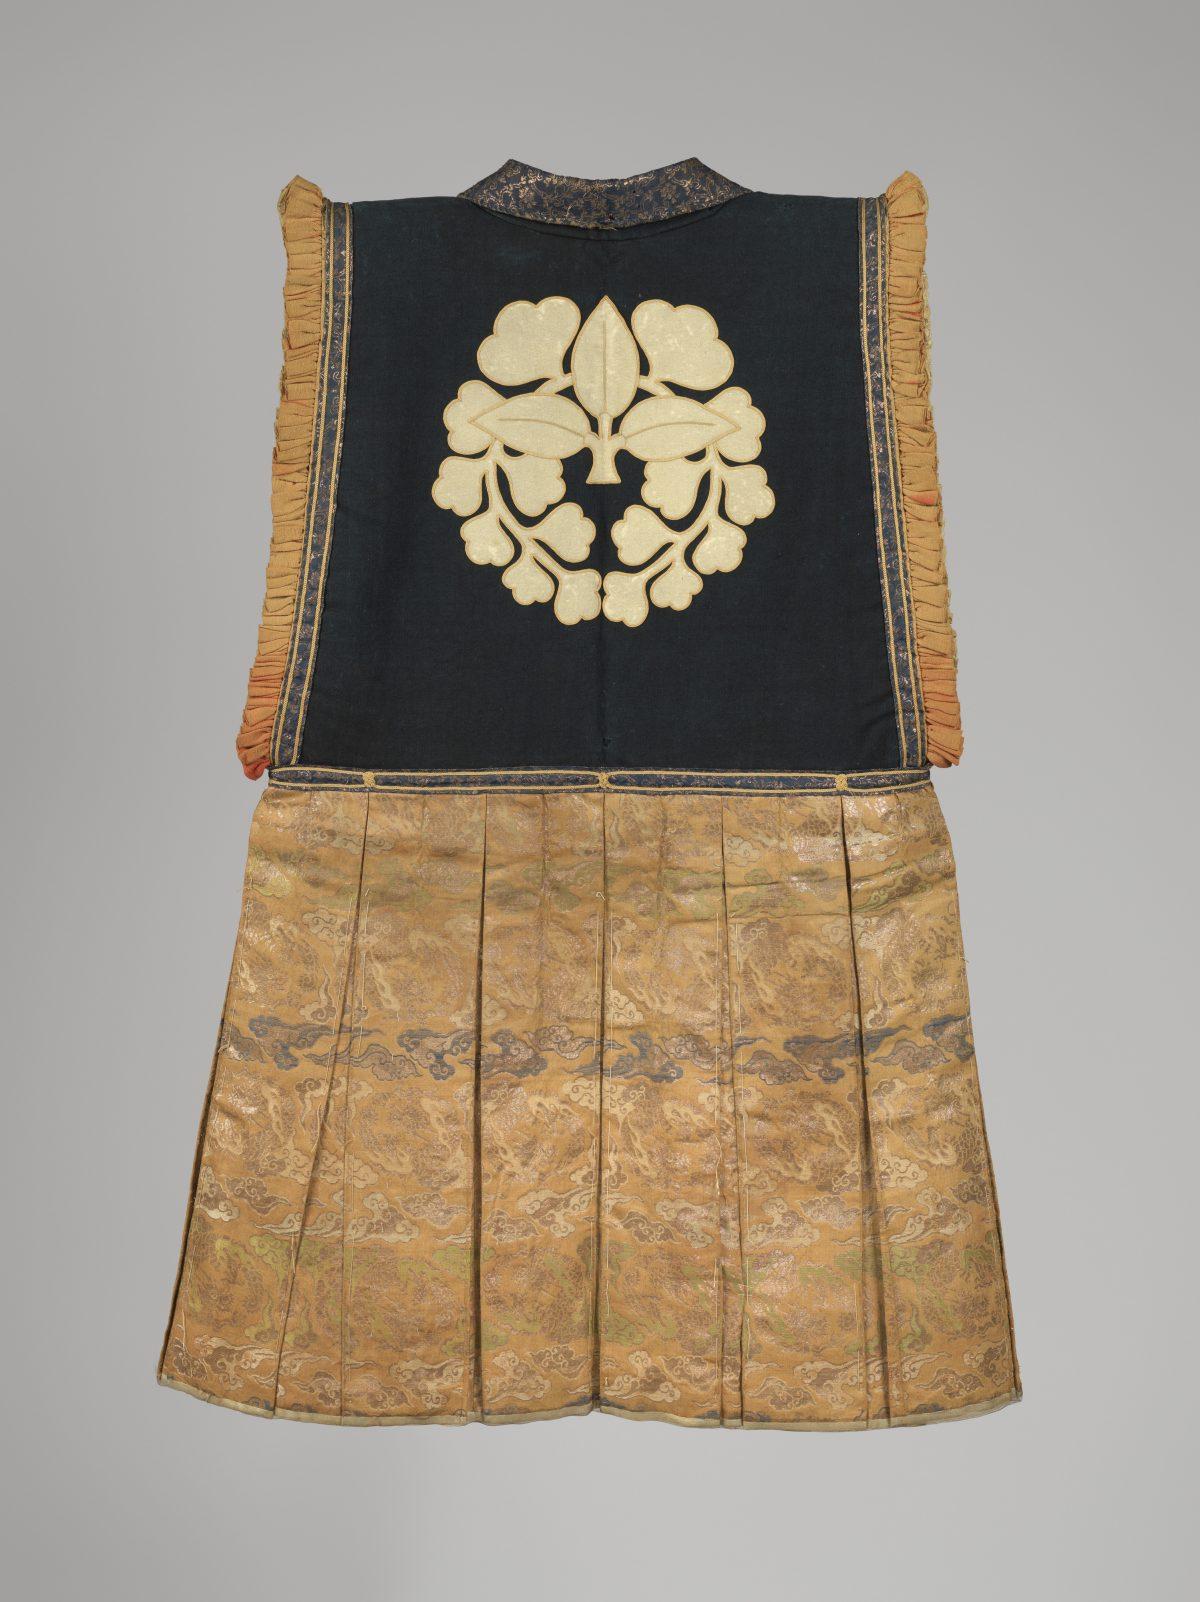 Surcoat (jinbaori) back